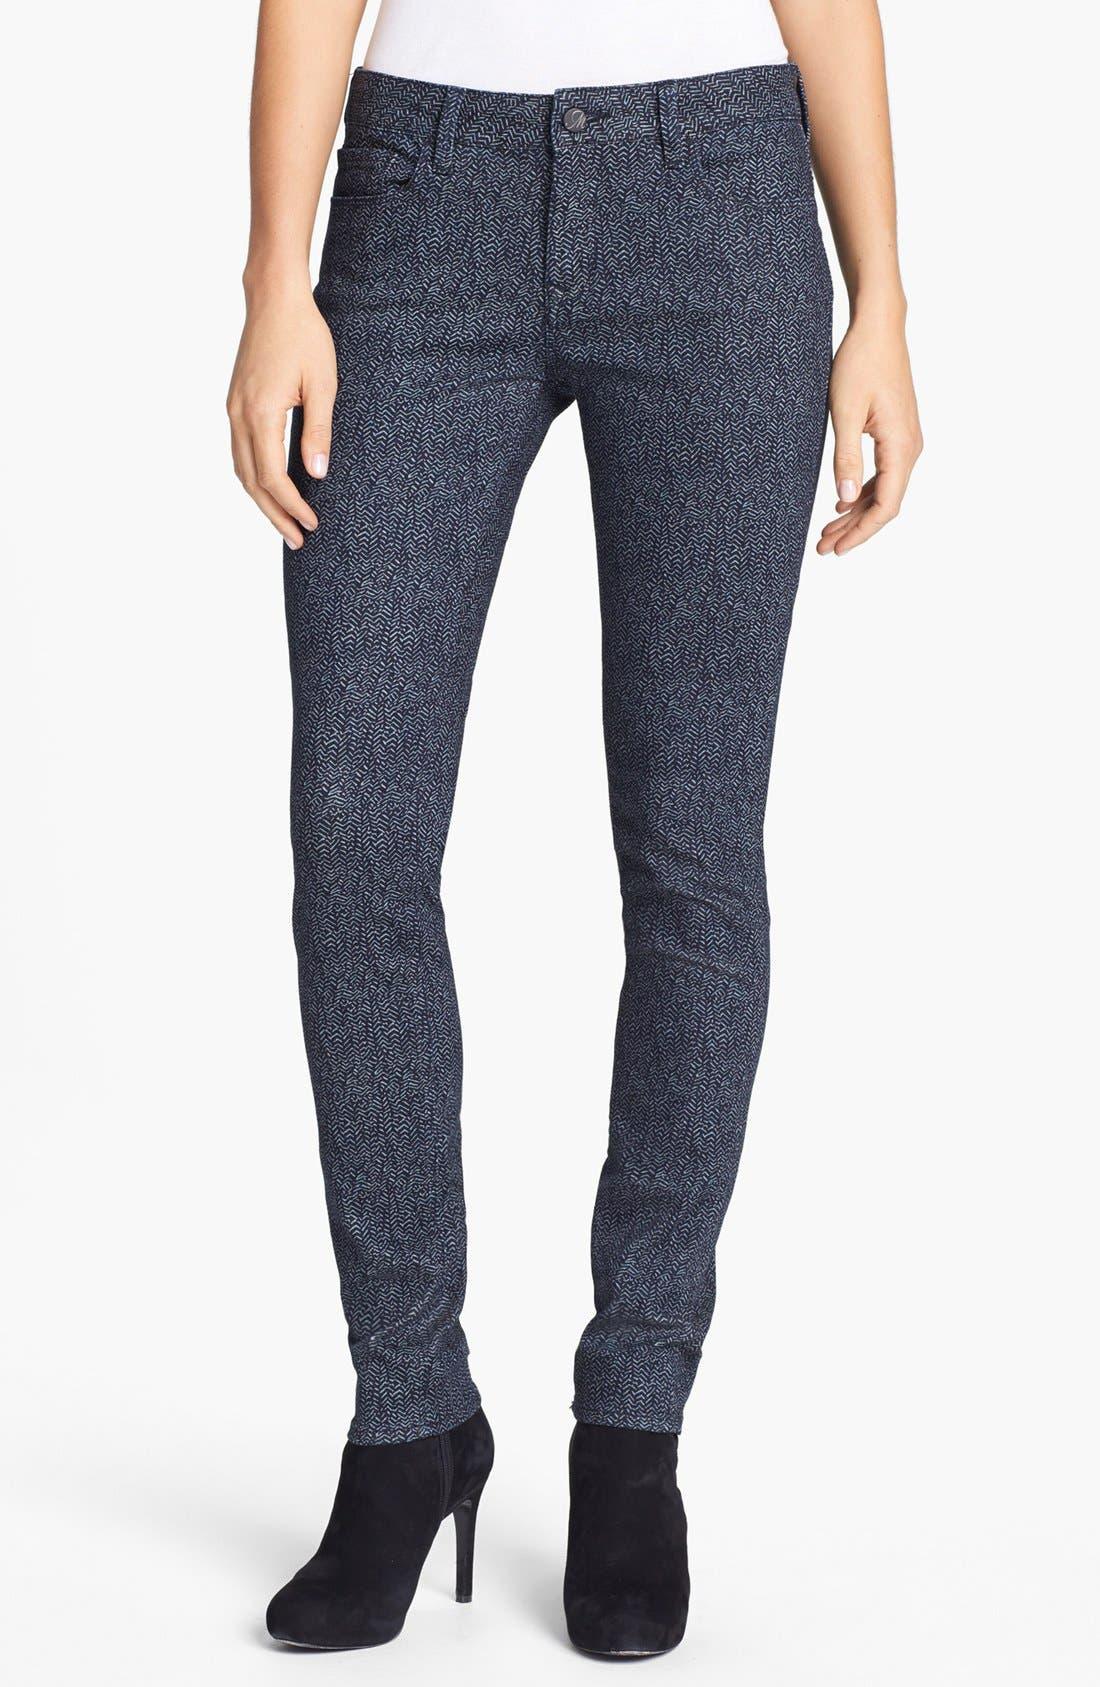 Alternate Image 1 Selected - Mavi Jeans 'Alexa' Print Skinny Jeans (Indigo Geometric)